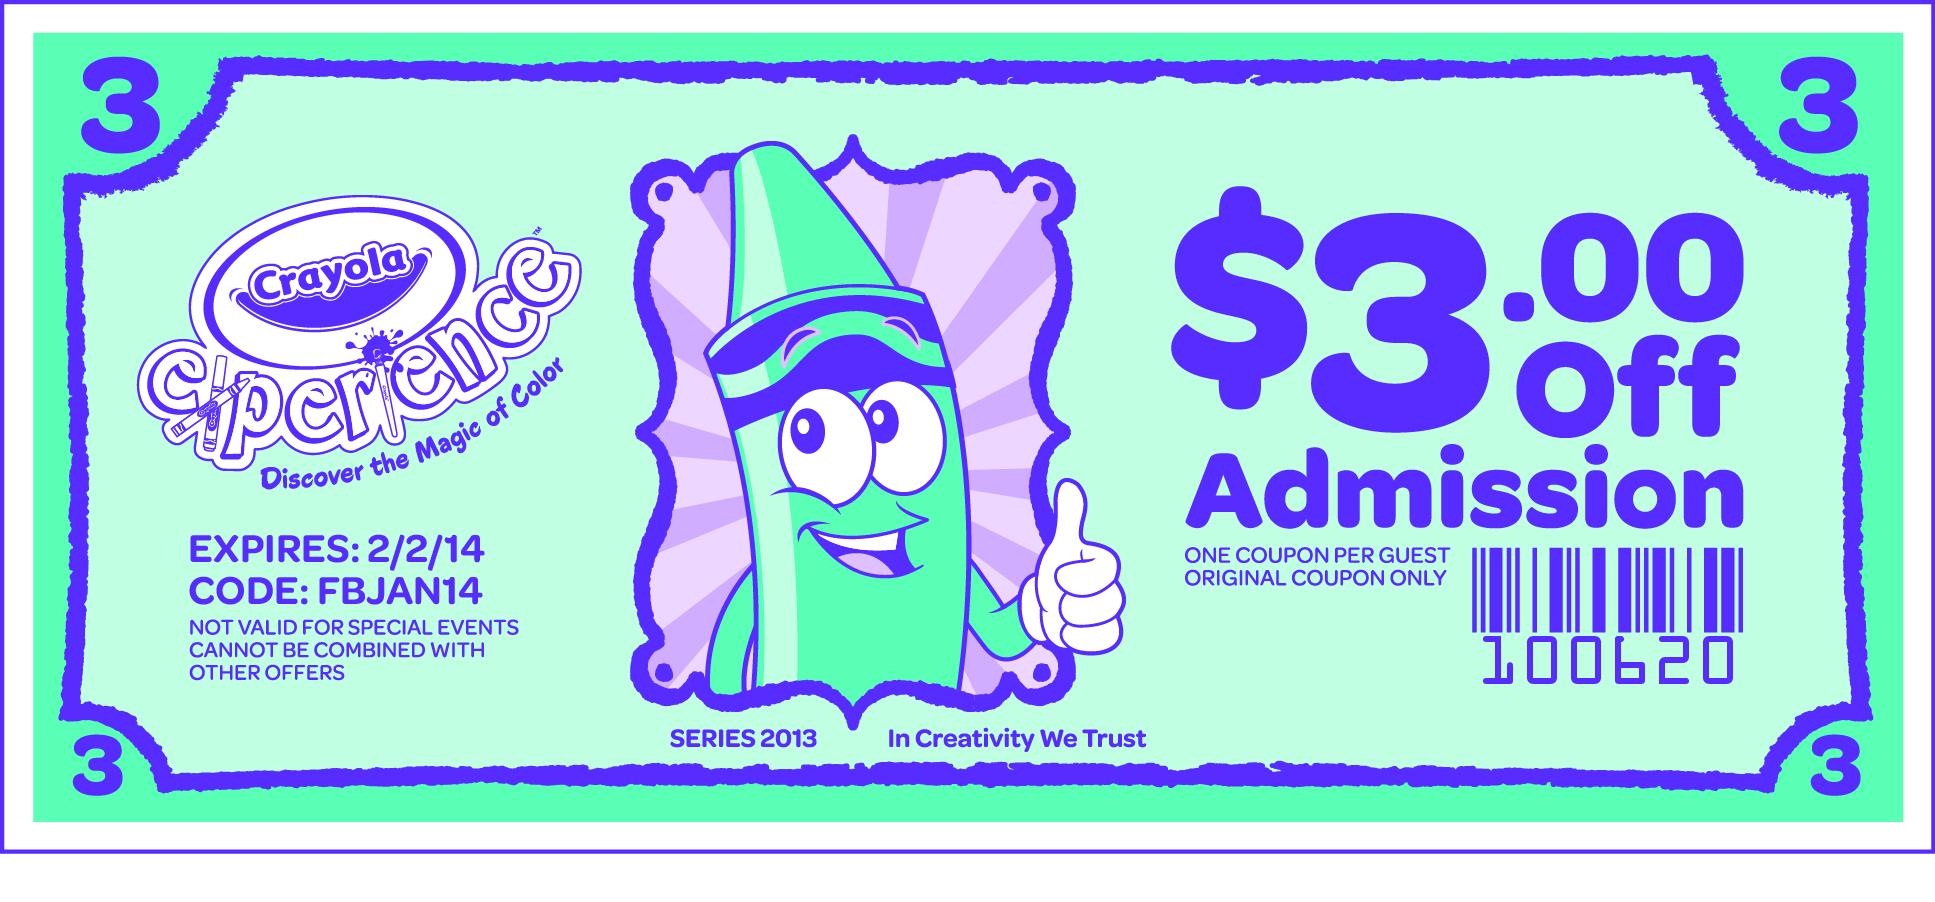 crayola experience coupon codes